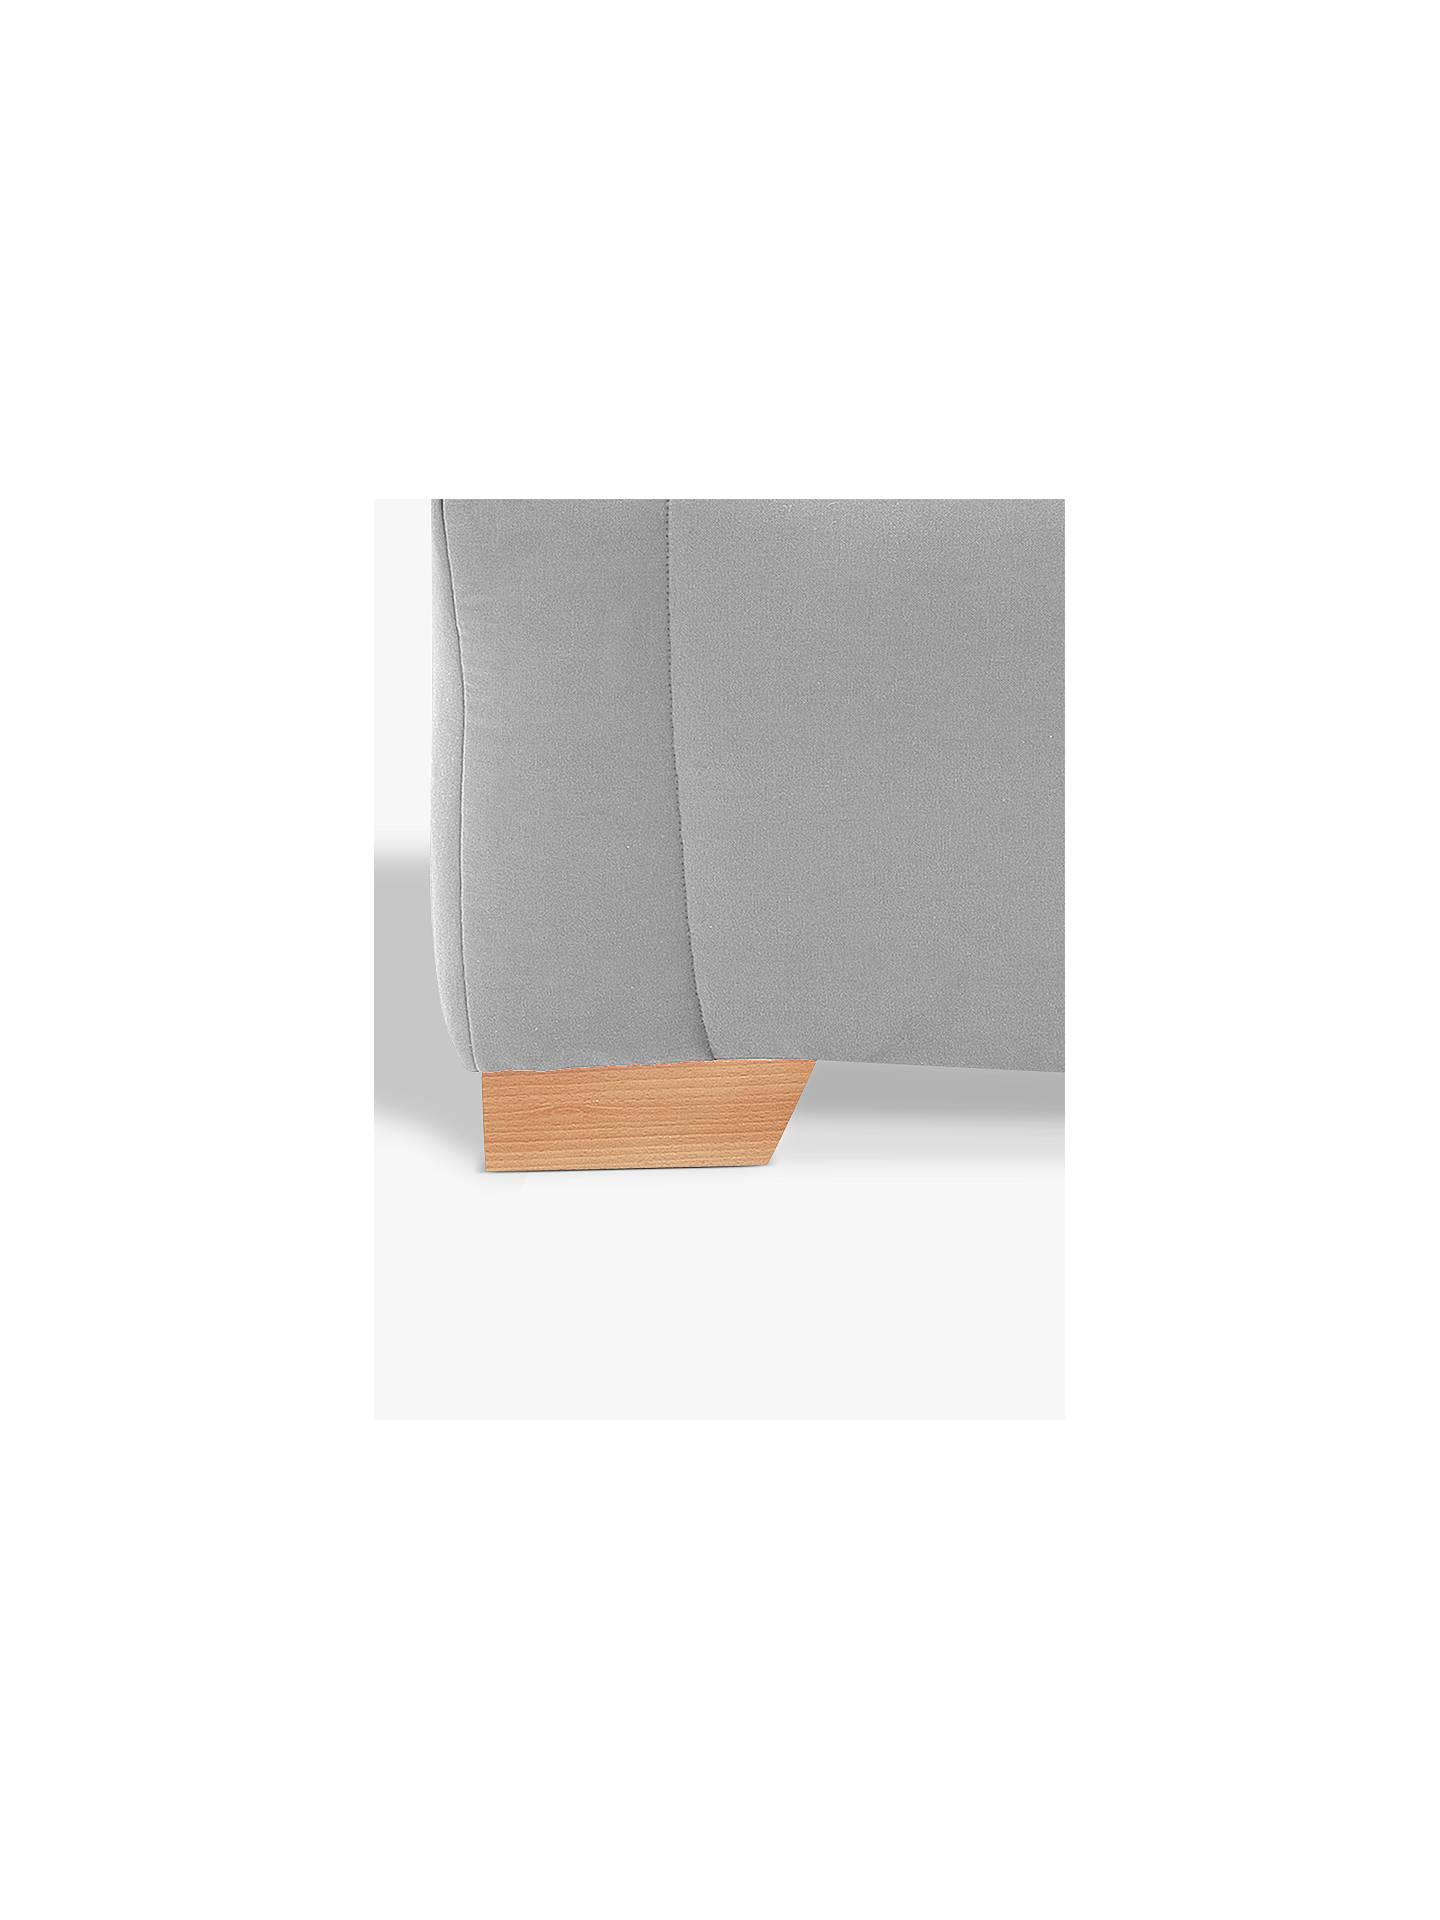 585ce13ae586 ... Buy John Lewis & Partners Strauss Large 3 Seater Sofa Bed, Light Leg,  Fraser ...